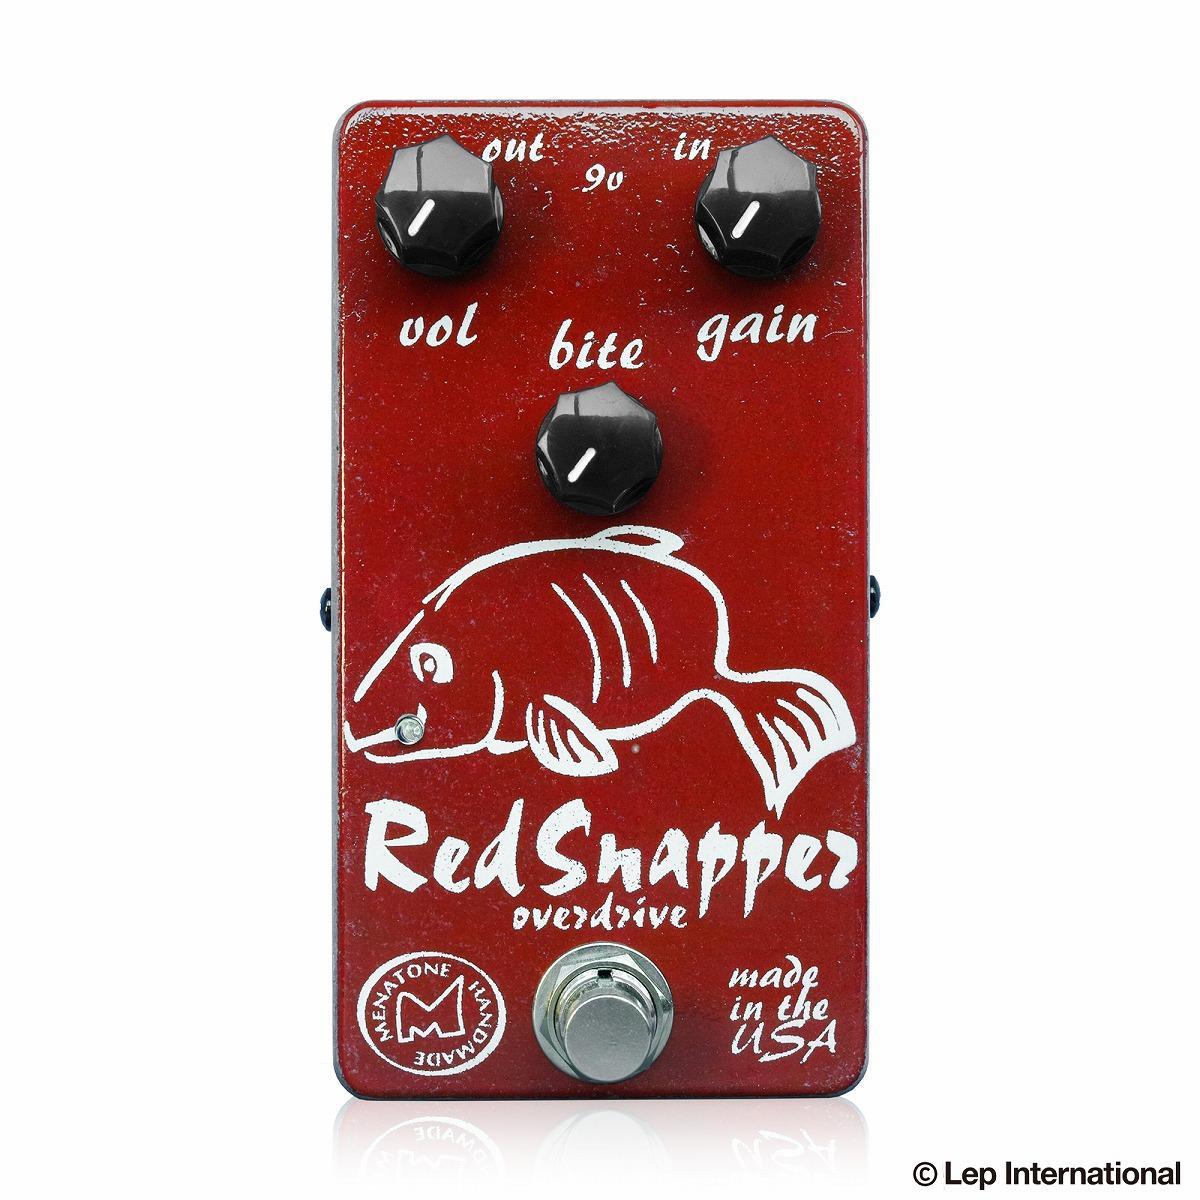 Menatone Red Snapper 3knob / ギター エフェクター オーバードライブ